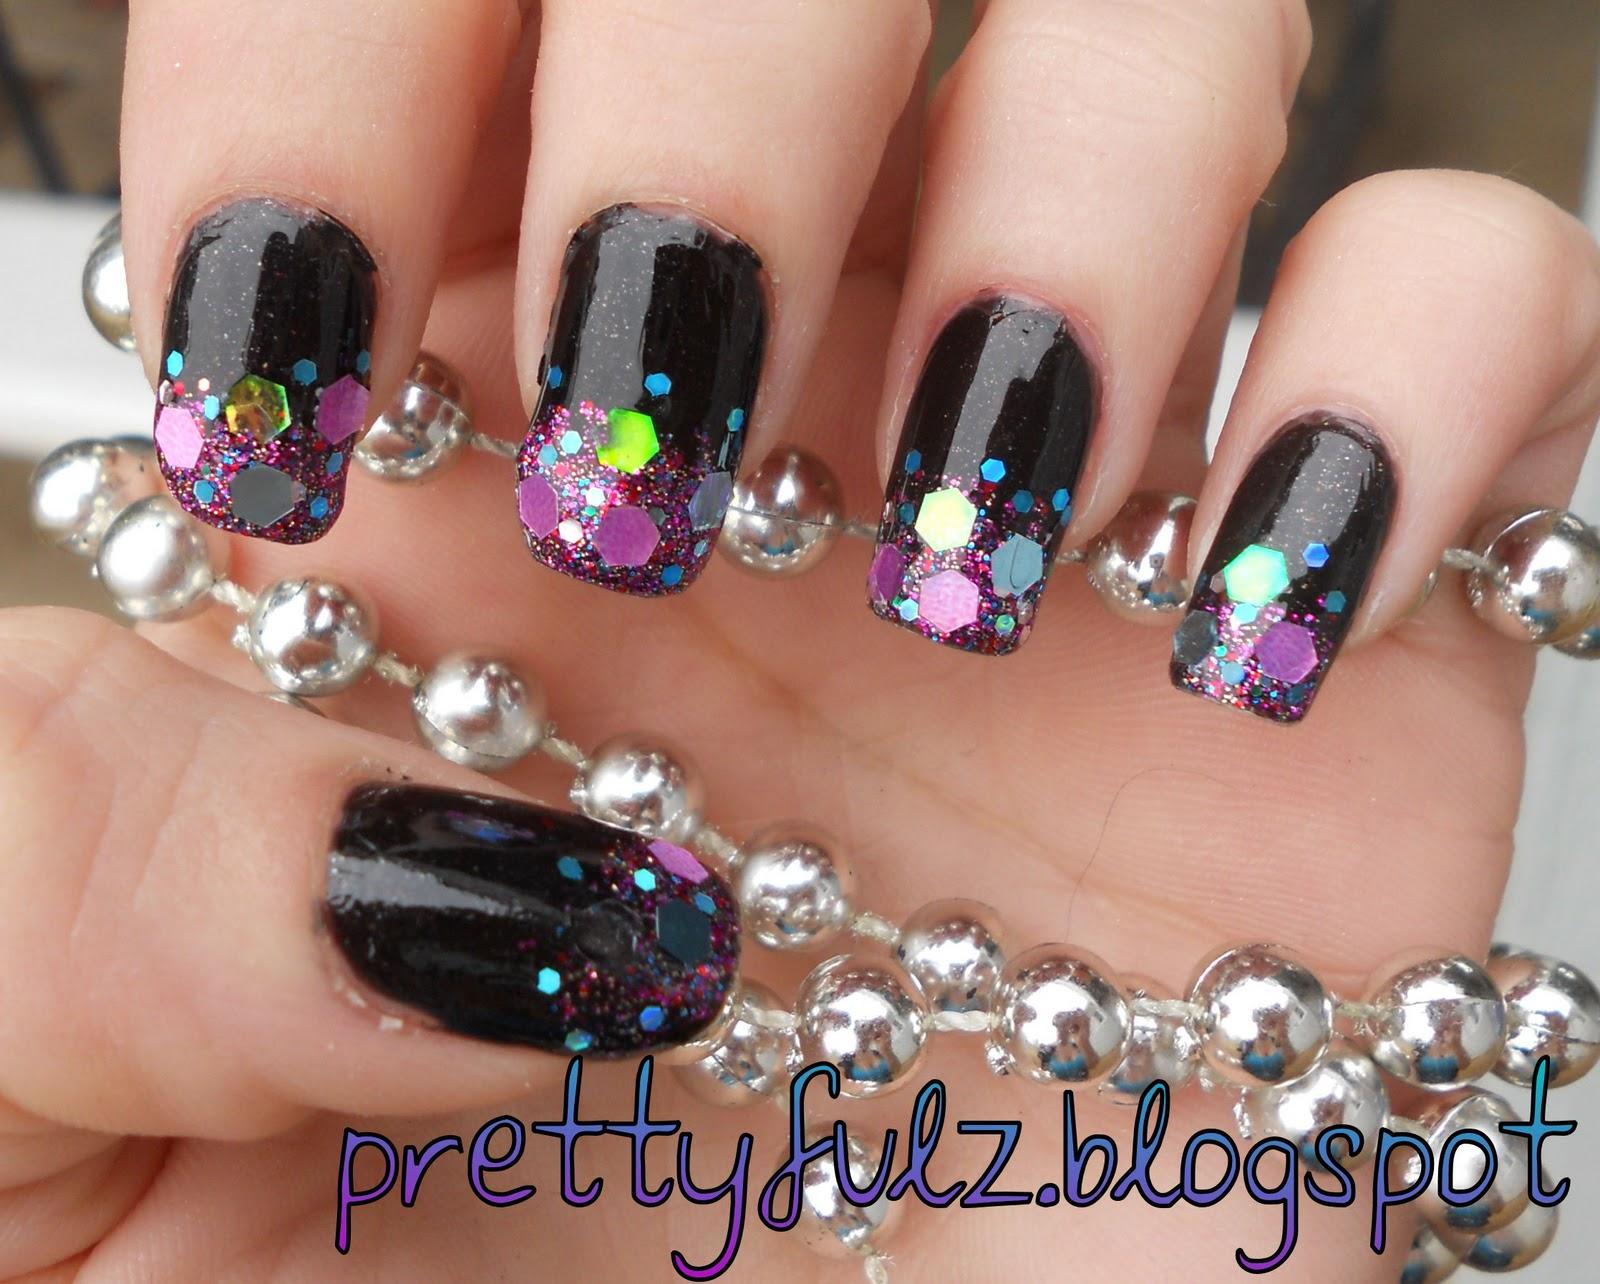 Prettyfulz: CUTE NAIL ART DESIGN | Glitter & Shimmer Nail ...